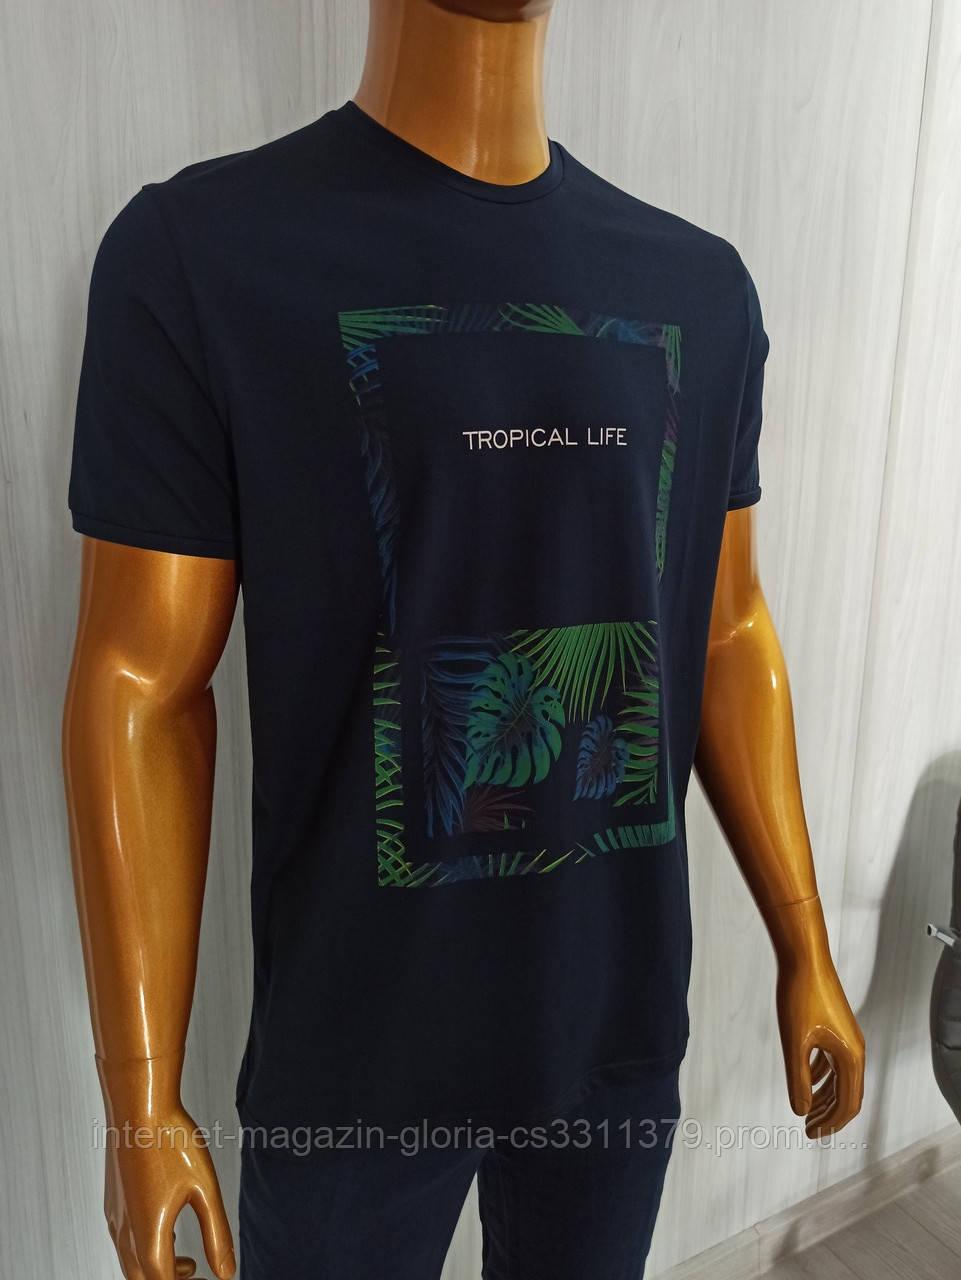 Мужская футболка Tony Montana. MSL-2066(тёмносиний). Размеры: M,L,XL,XXL.